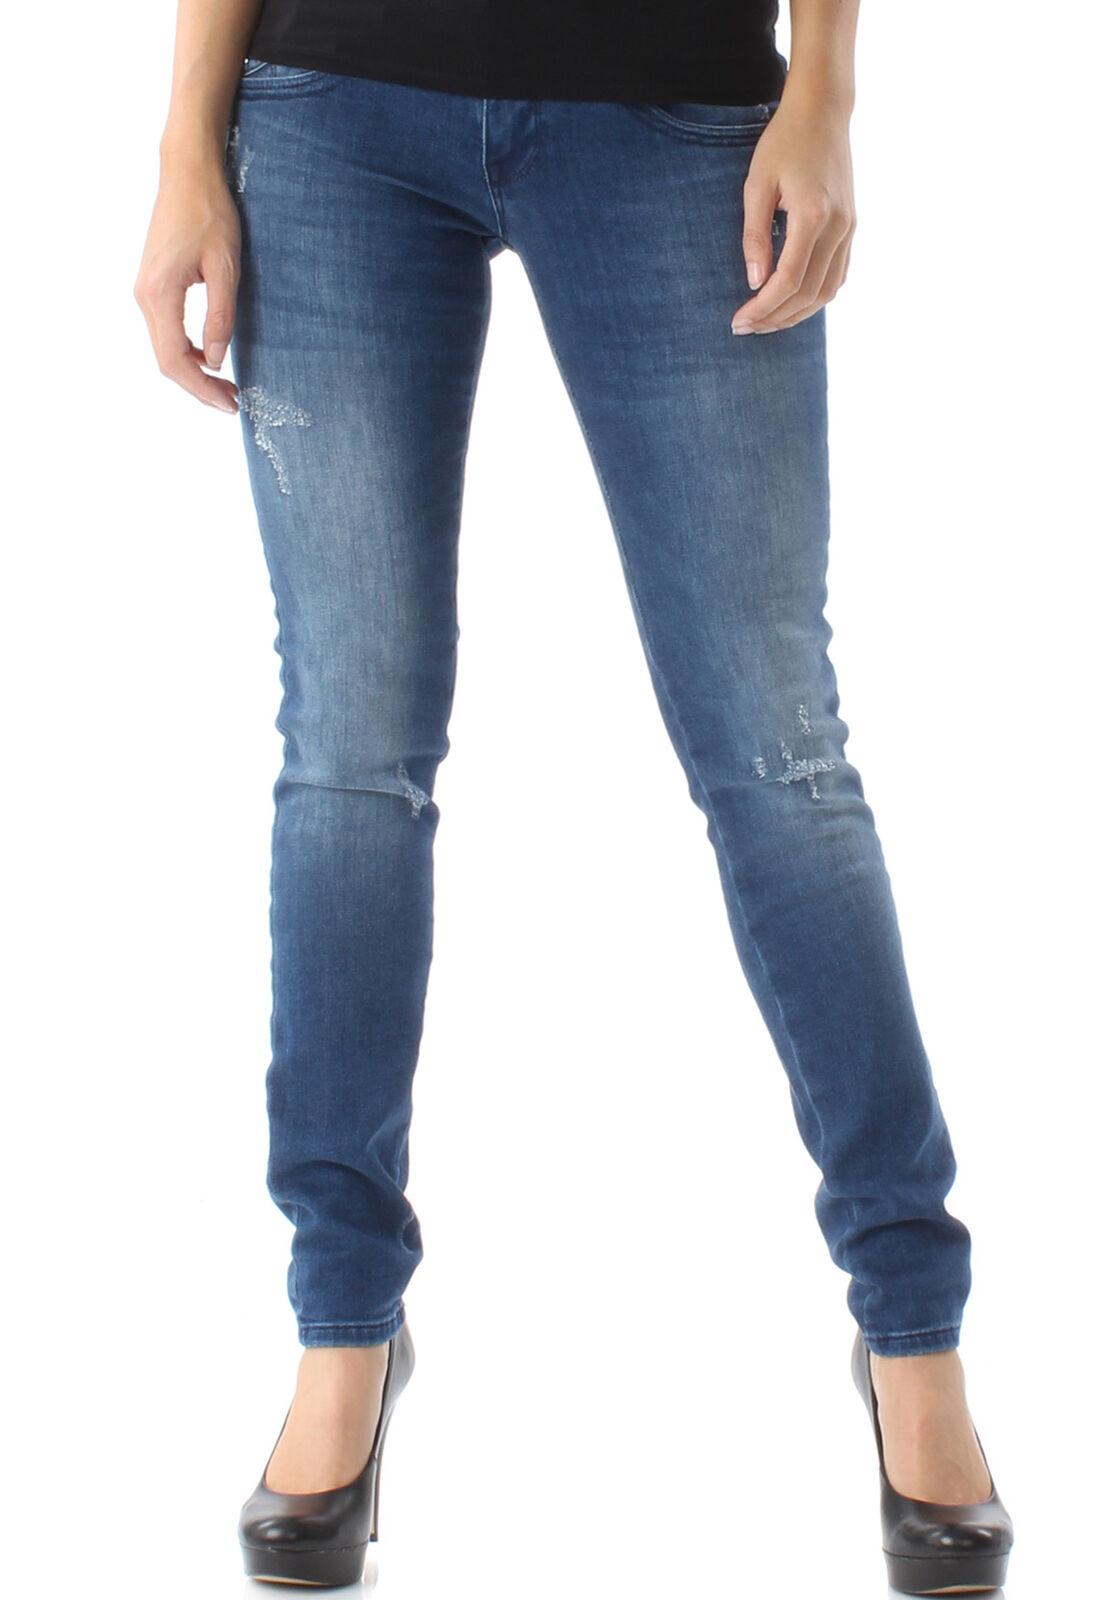 Ltb Women's Jeans Molly Dita Wash Medium bluee